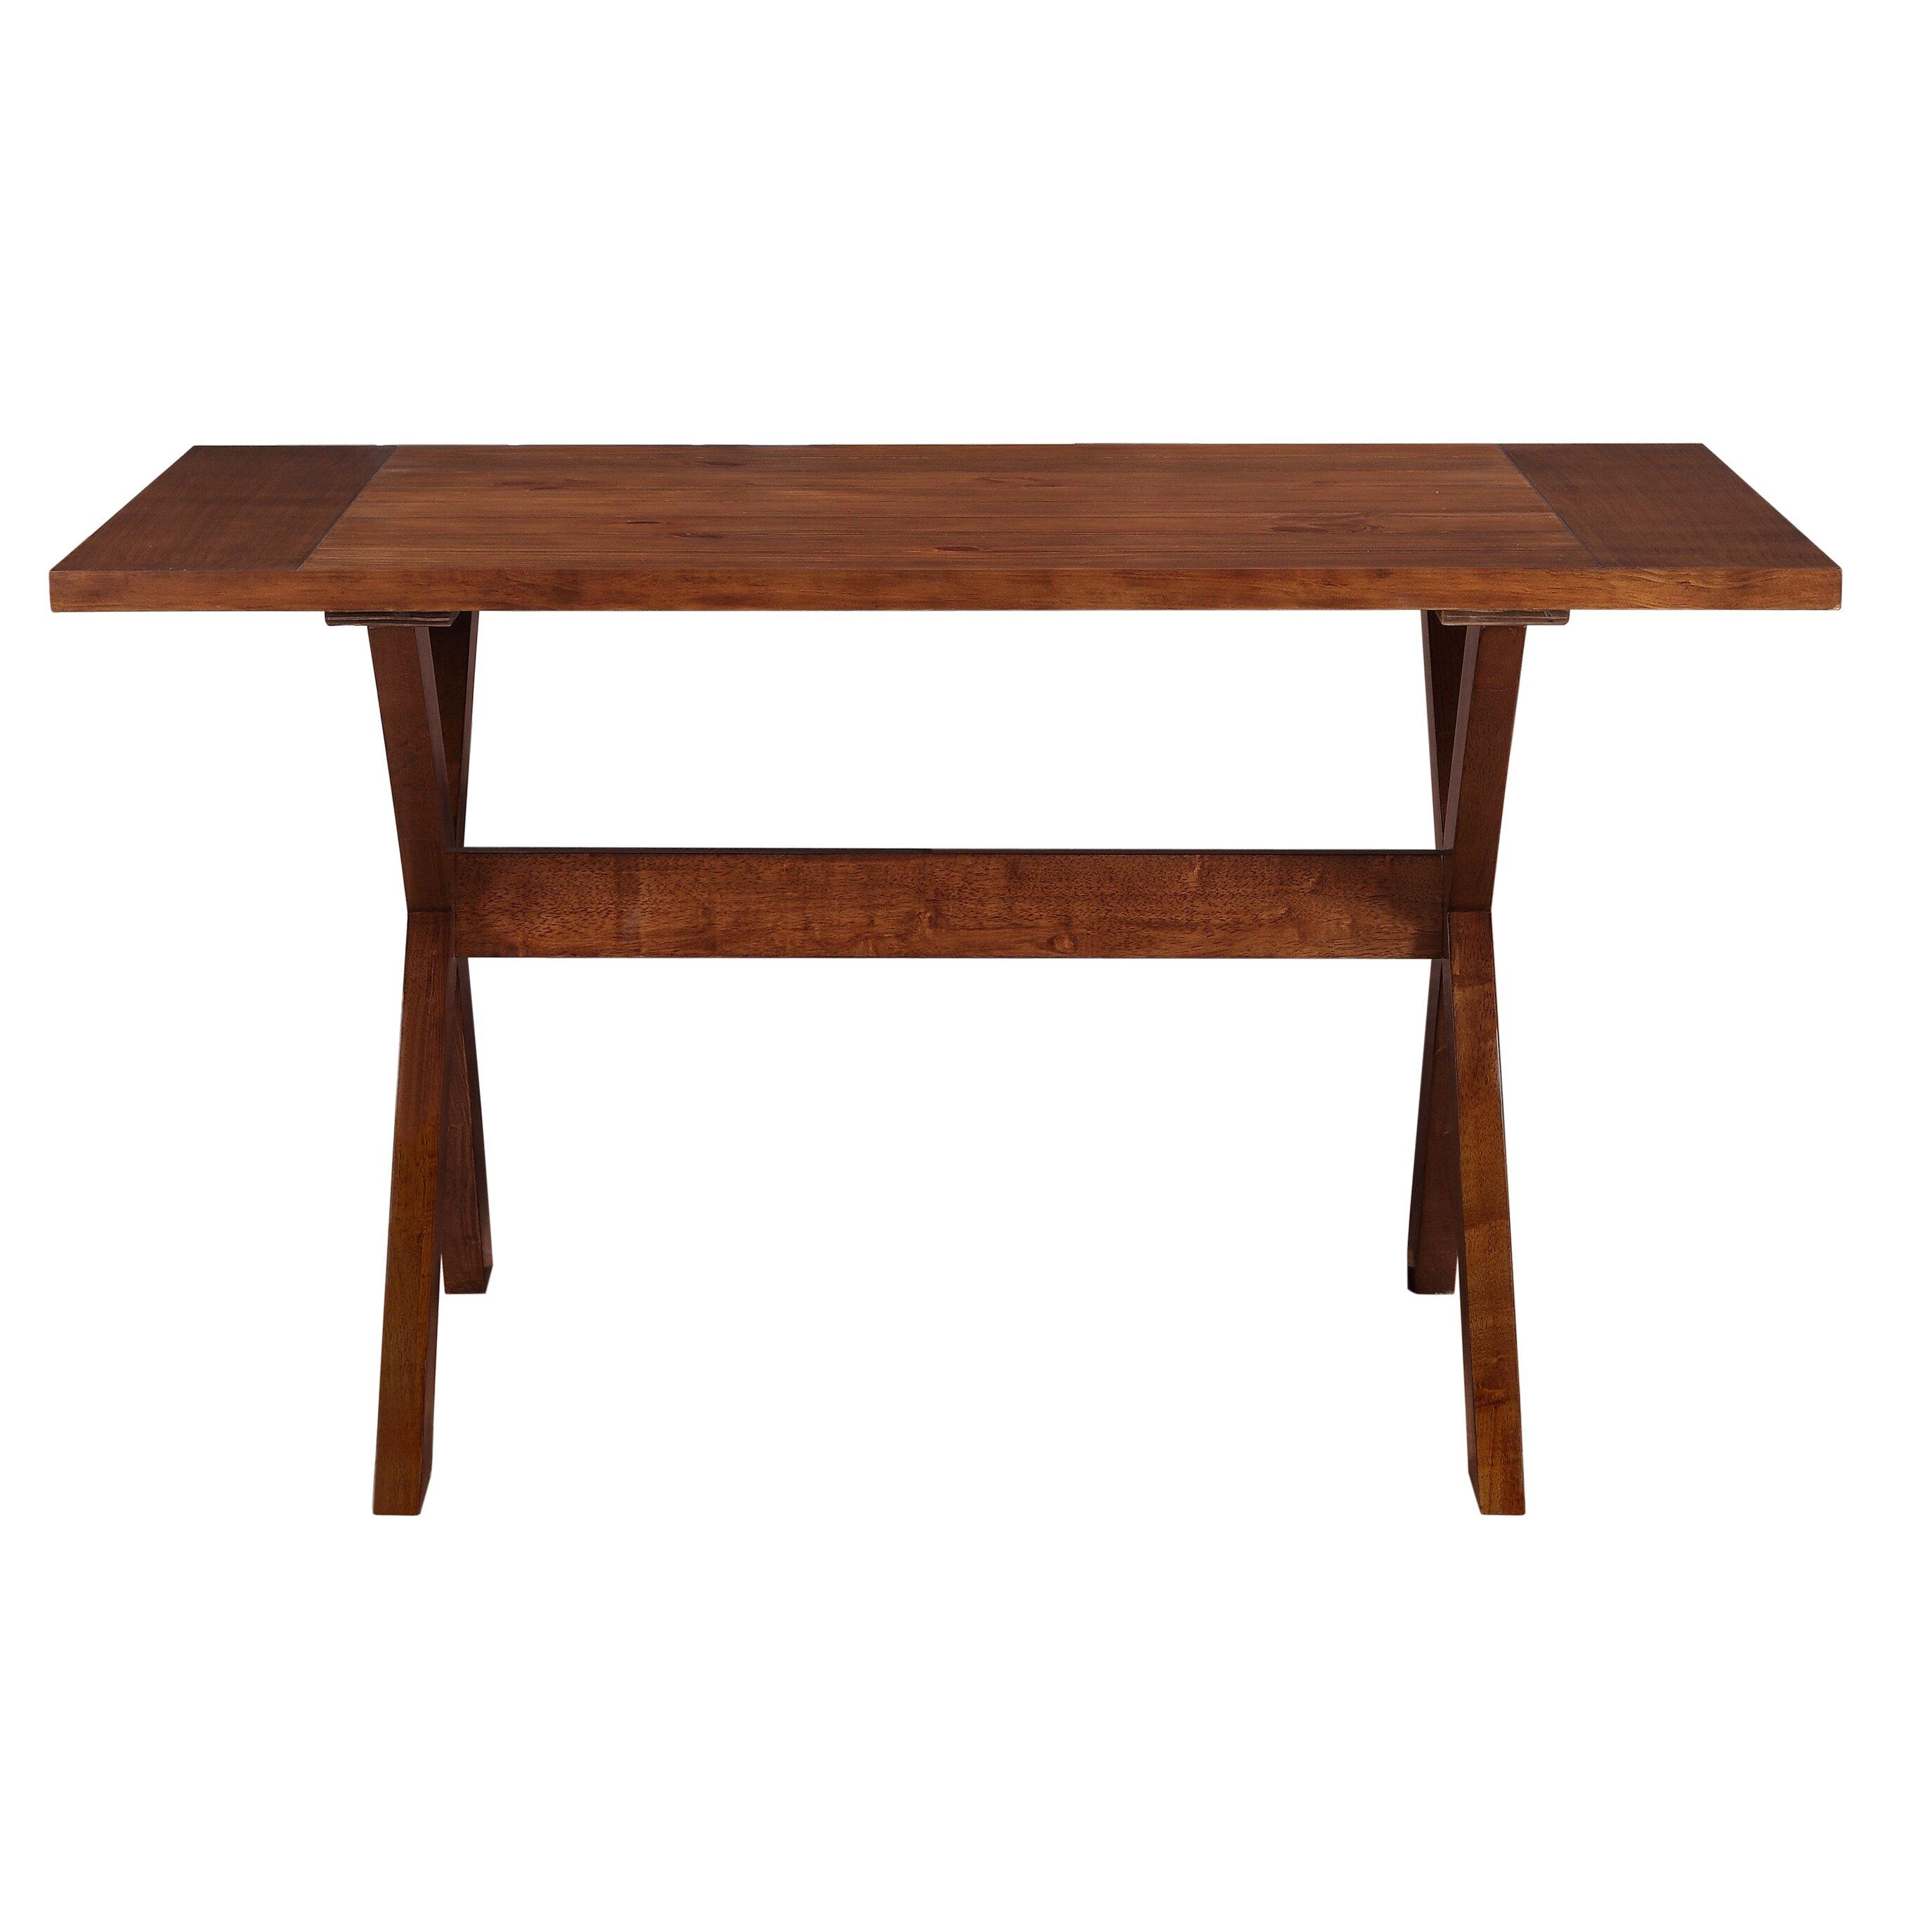 Dorel living trestle dining table reviews wayfair for Trestle dining table